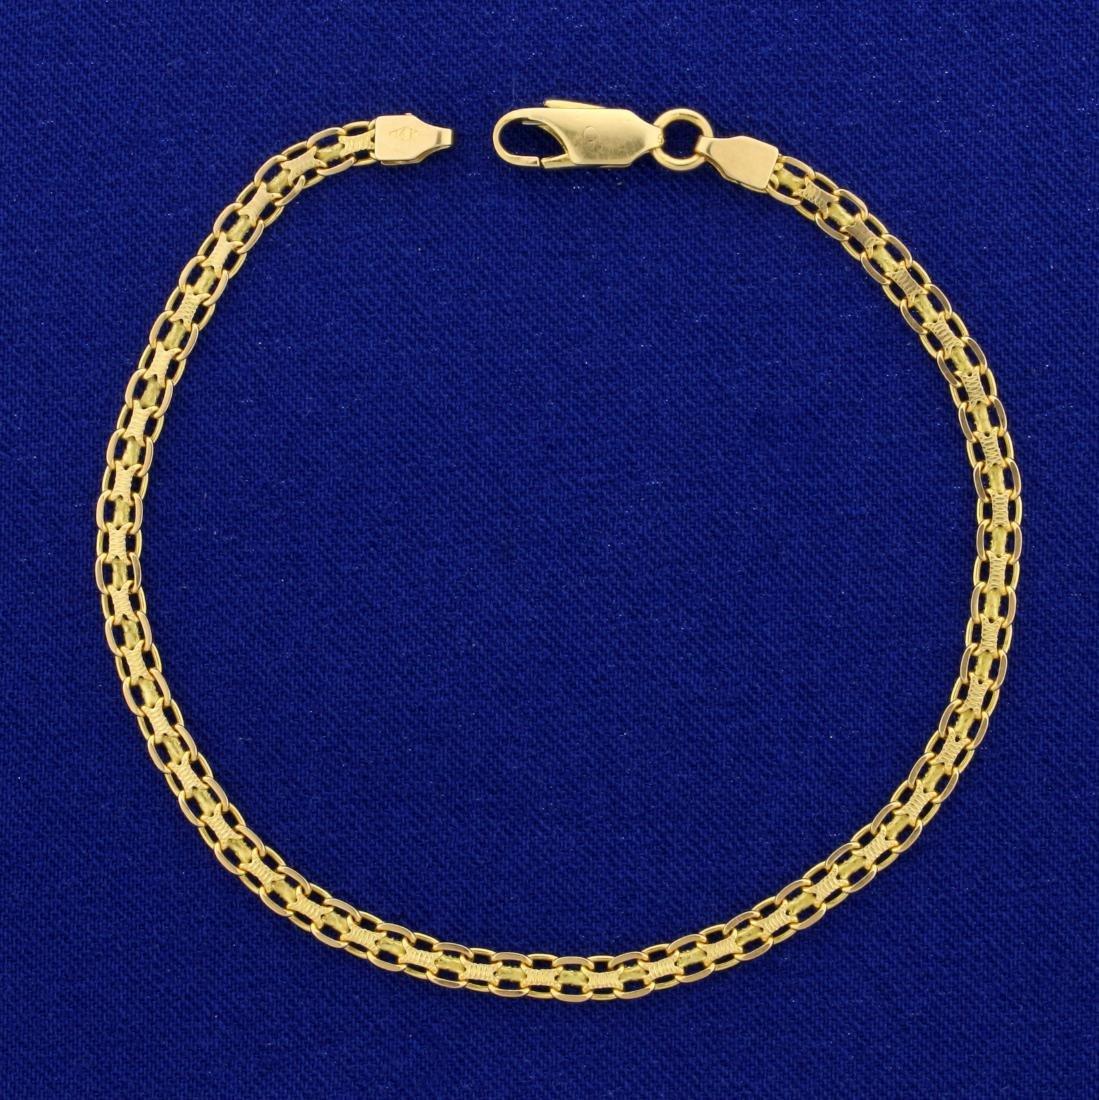 7 1/2 Inch Bismarck Link Bracelet in 14K Yellow Gold